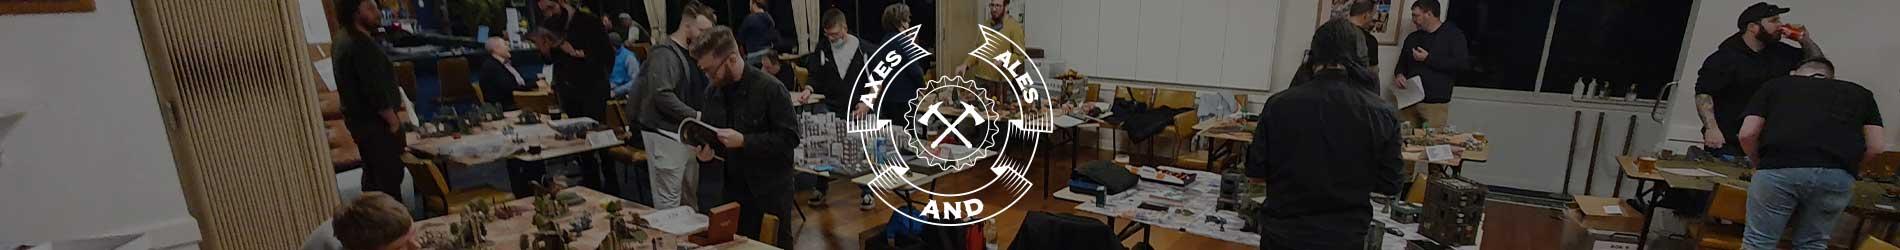 Axes & Ales Gaming Club